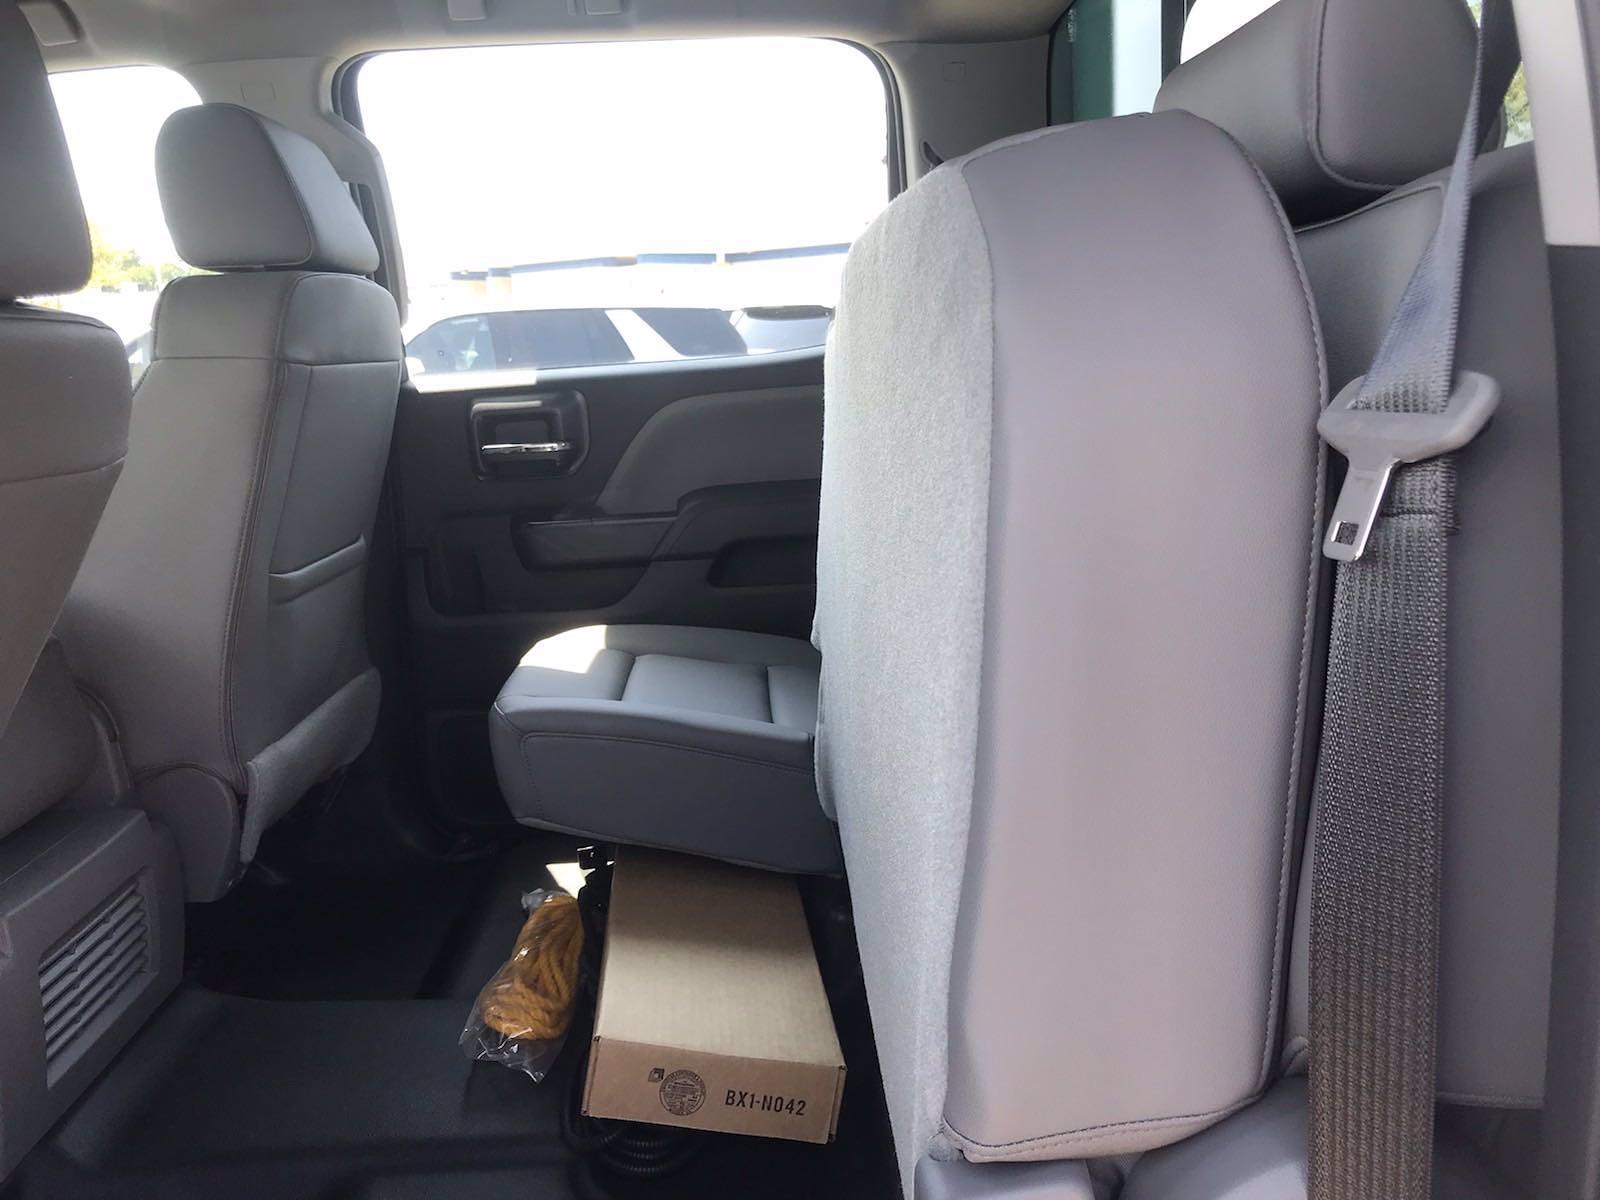 2021 Chevrolet Silverado 5500 Crew Cab DRW 4x4, Cab Chassis #CN16514 - photo 45